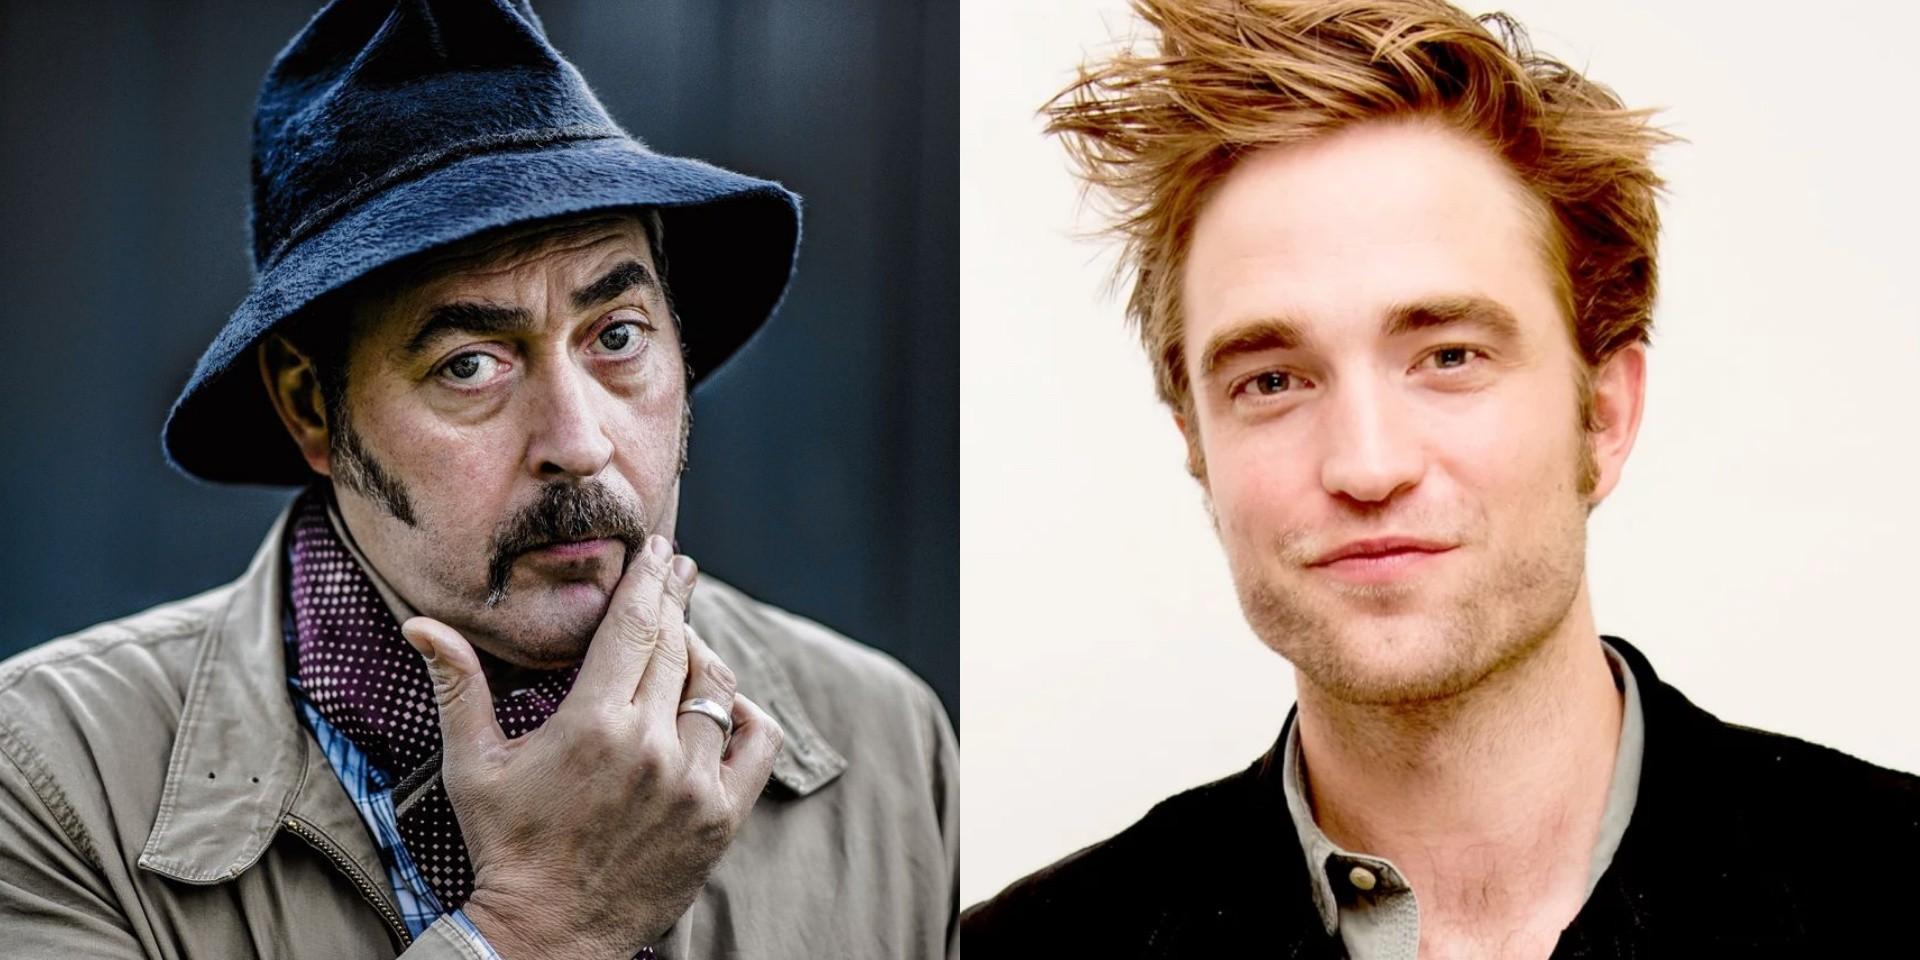 Tindersticks collaborates with Robert Pattinson on 'Willow' – listen